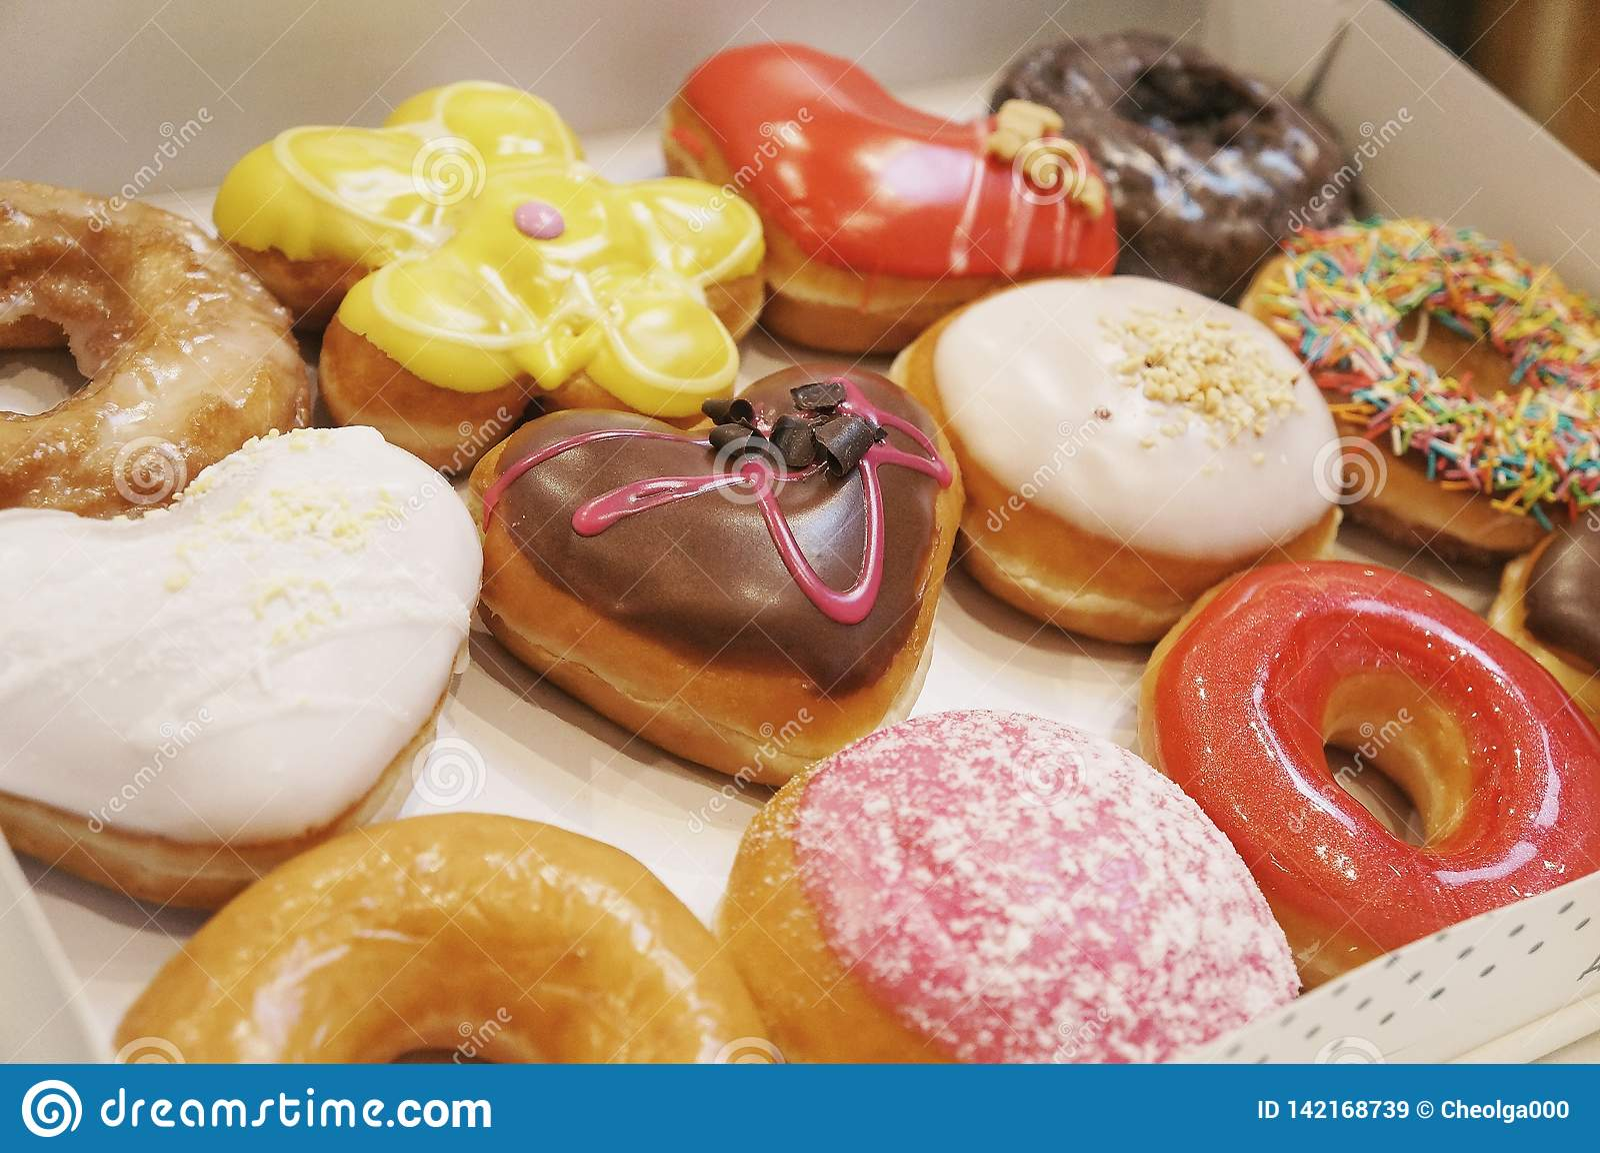 Donuts в коробке